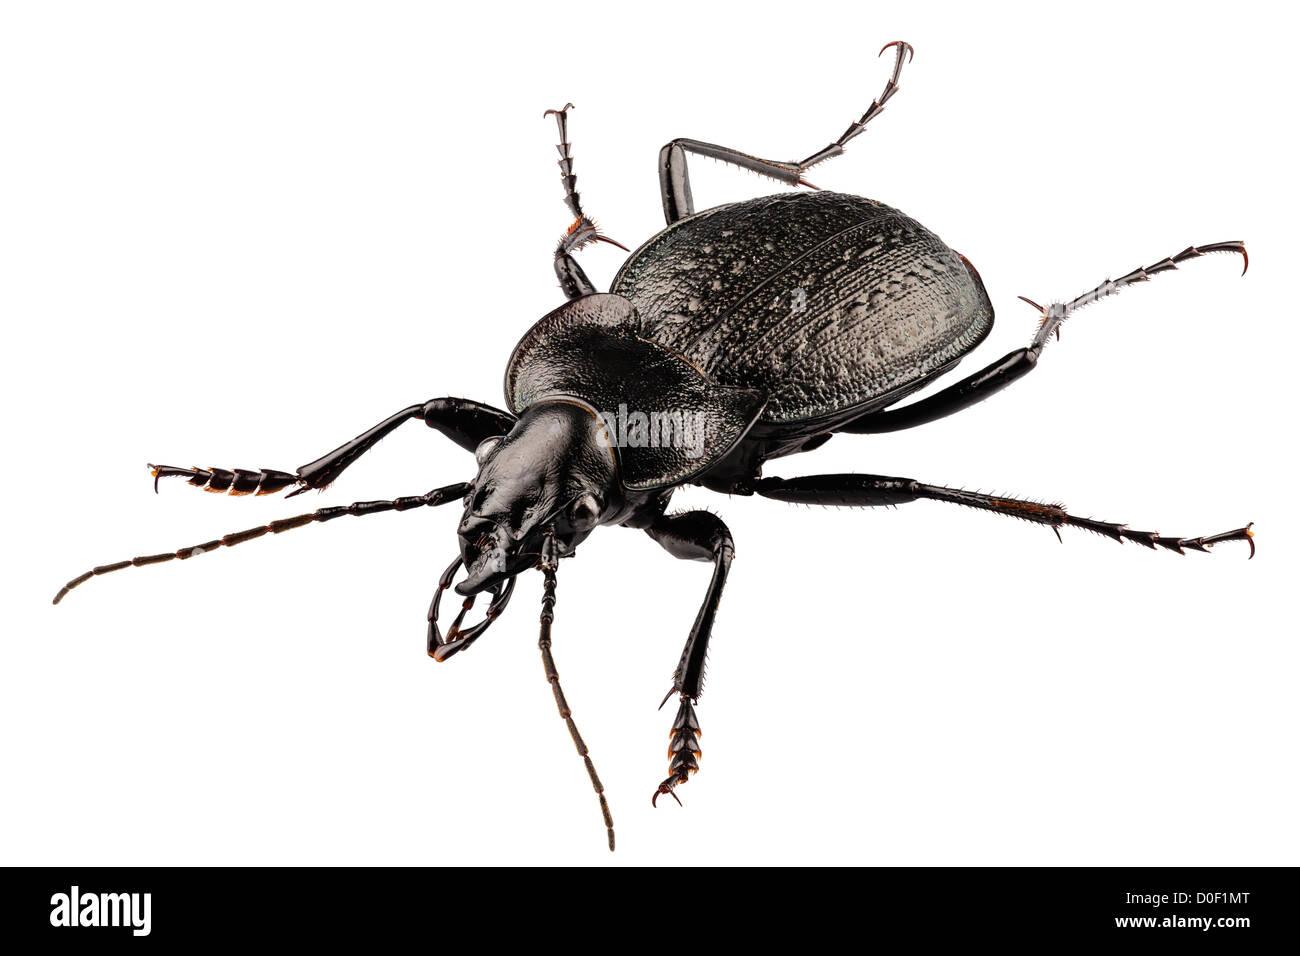 Käfer Arten Carabus Coriaceus Stockfoto Bild 51961752 Alamy